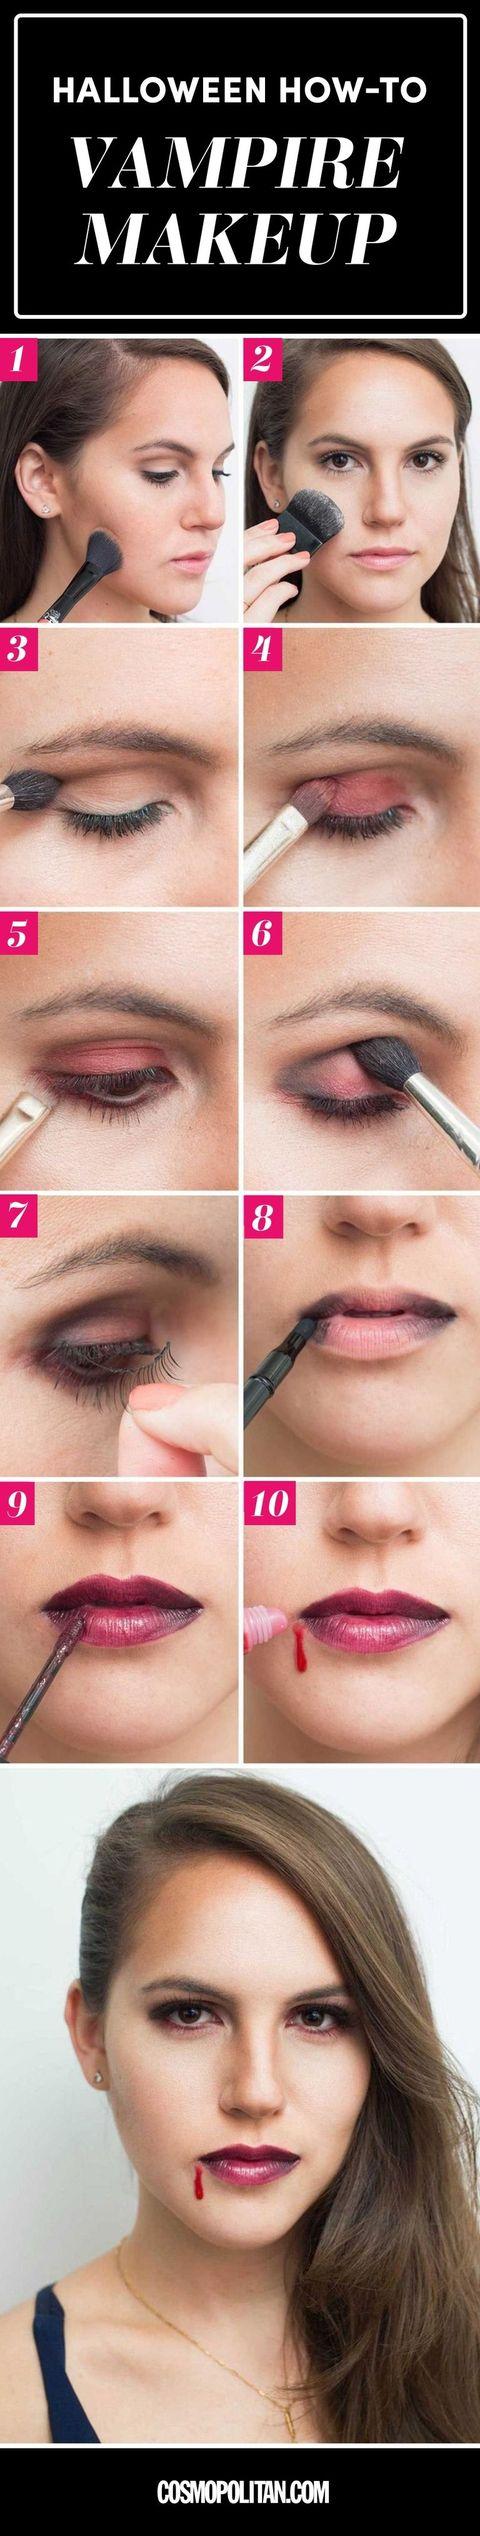 Easy vampire makeup tutorial for halloween how to do vampire makeup kathleen kamphausen baditri Image collections